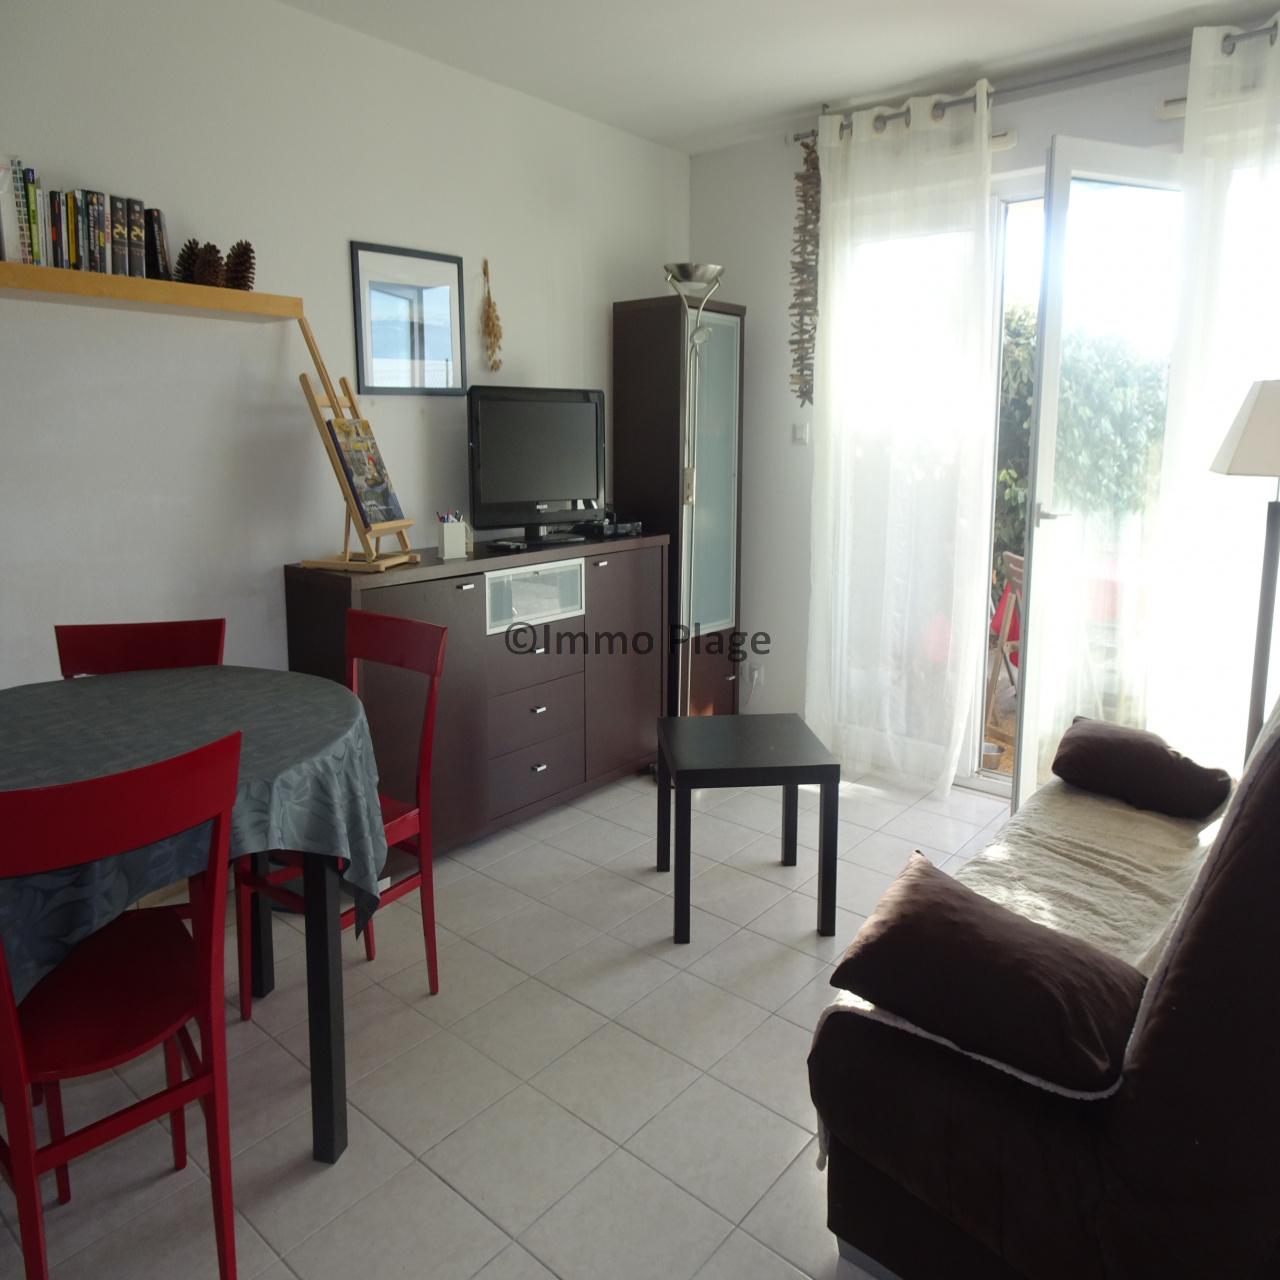 Image_5, Appartement, Soulac-sur-Mer, ref :3168